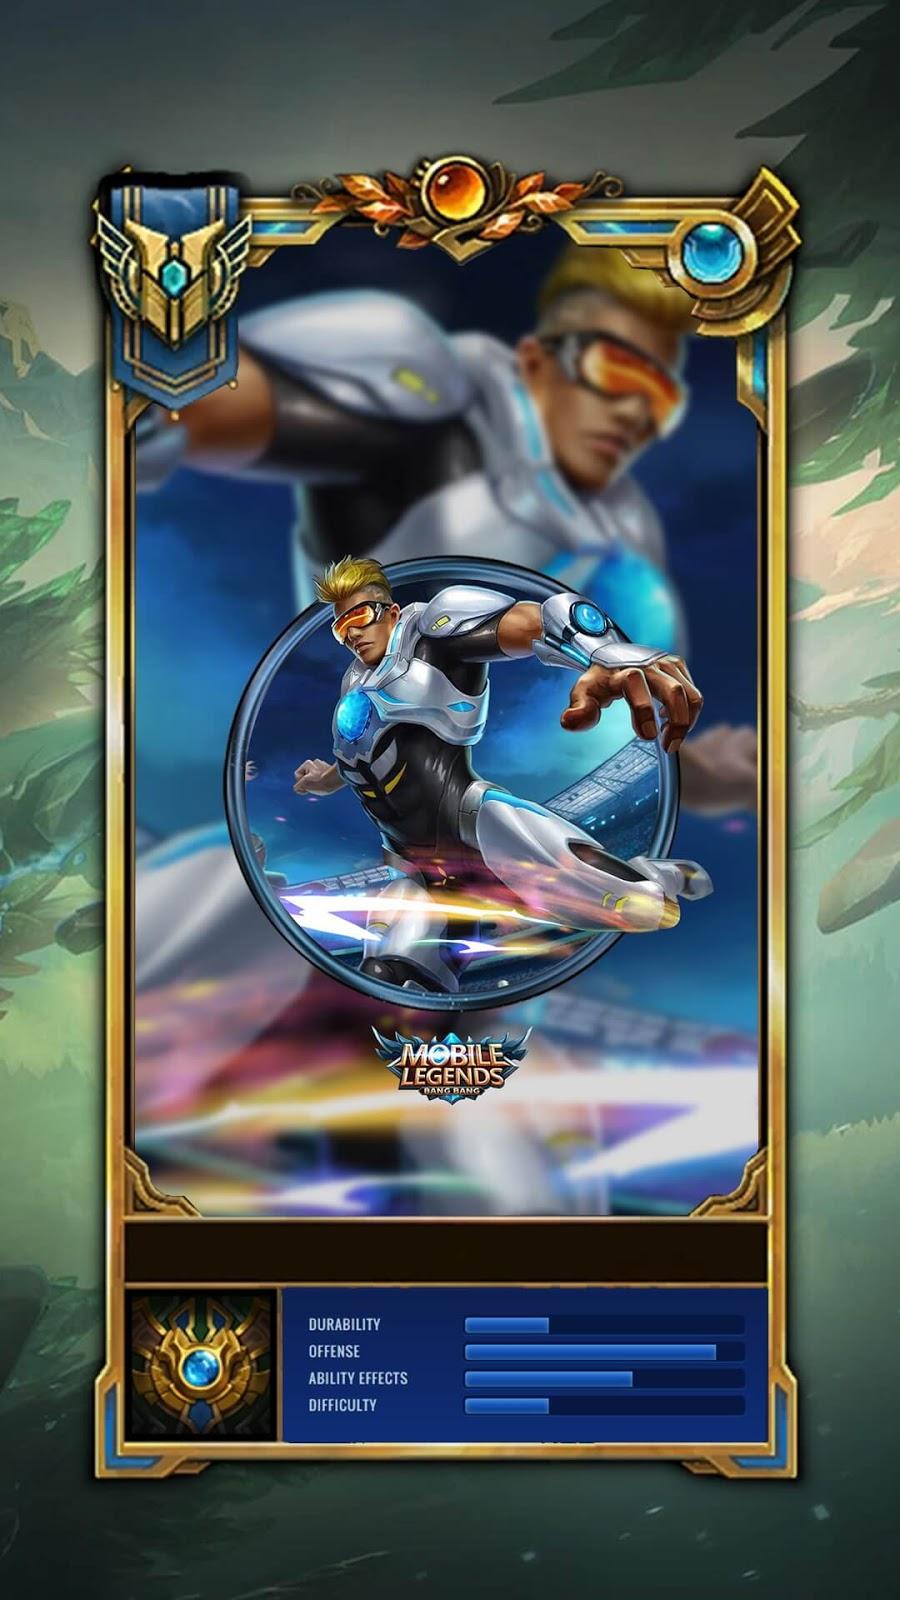 Wallpaper Bruno The Protector Skin Mobile Legends Full HD for Mobile